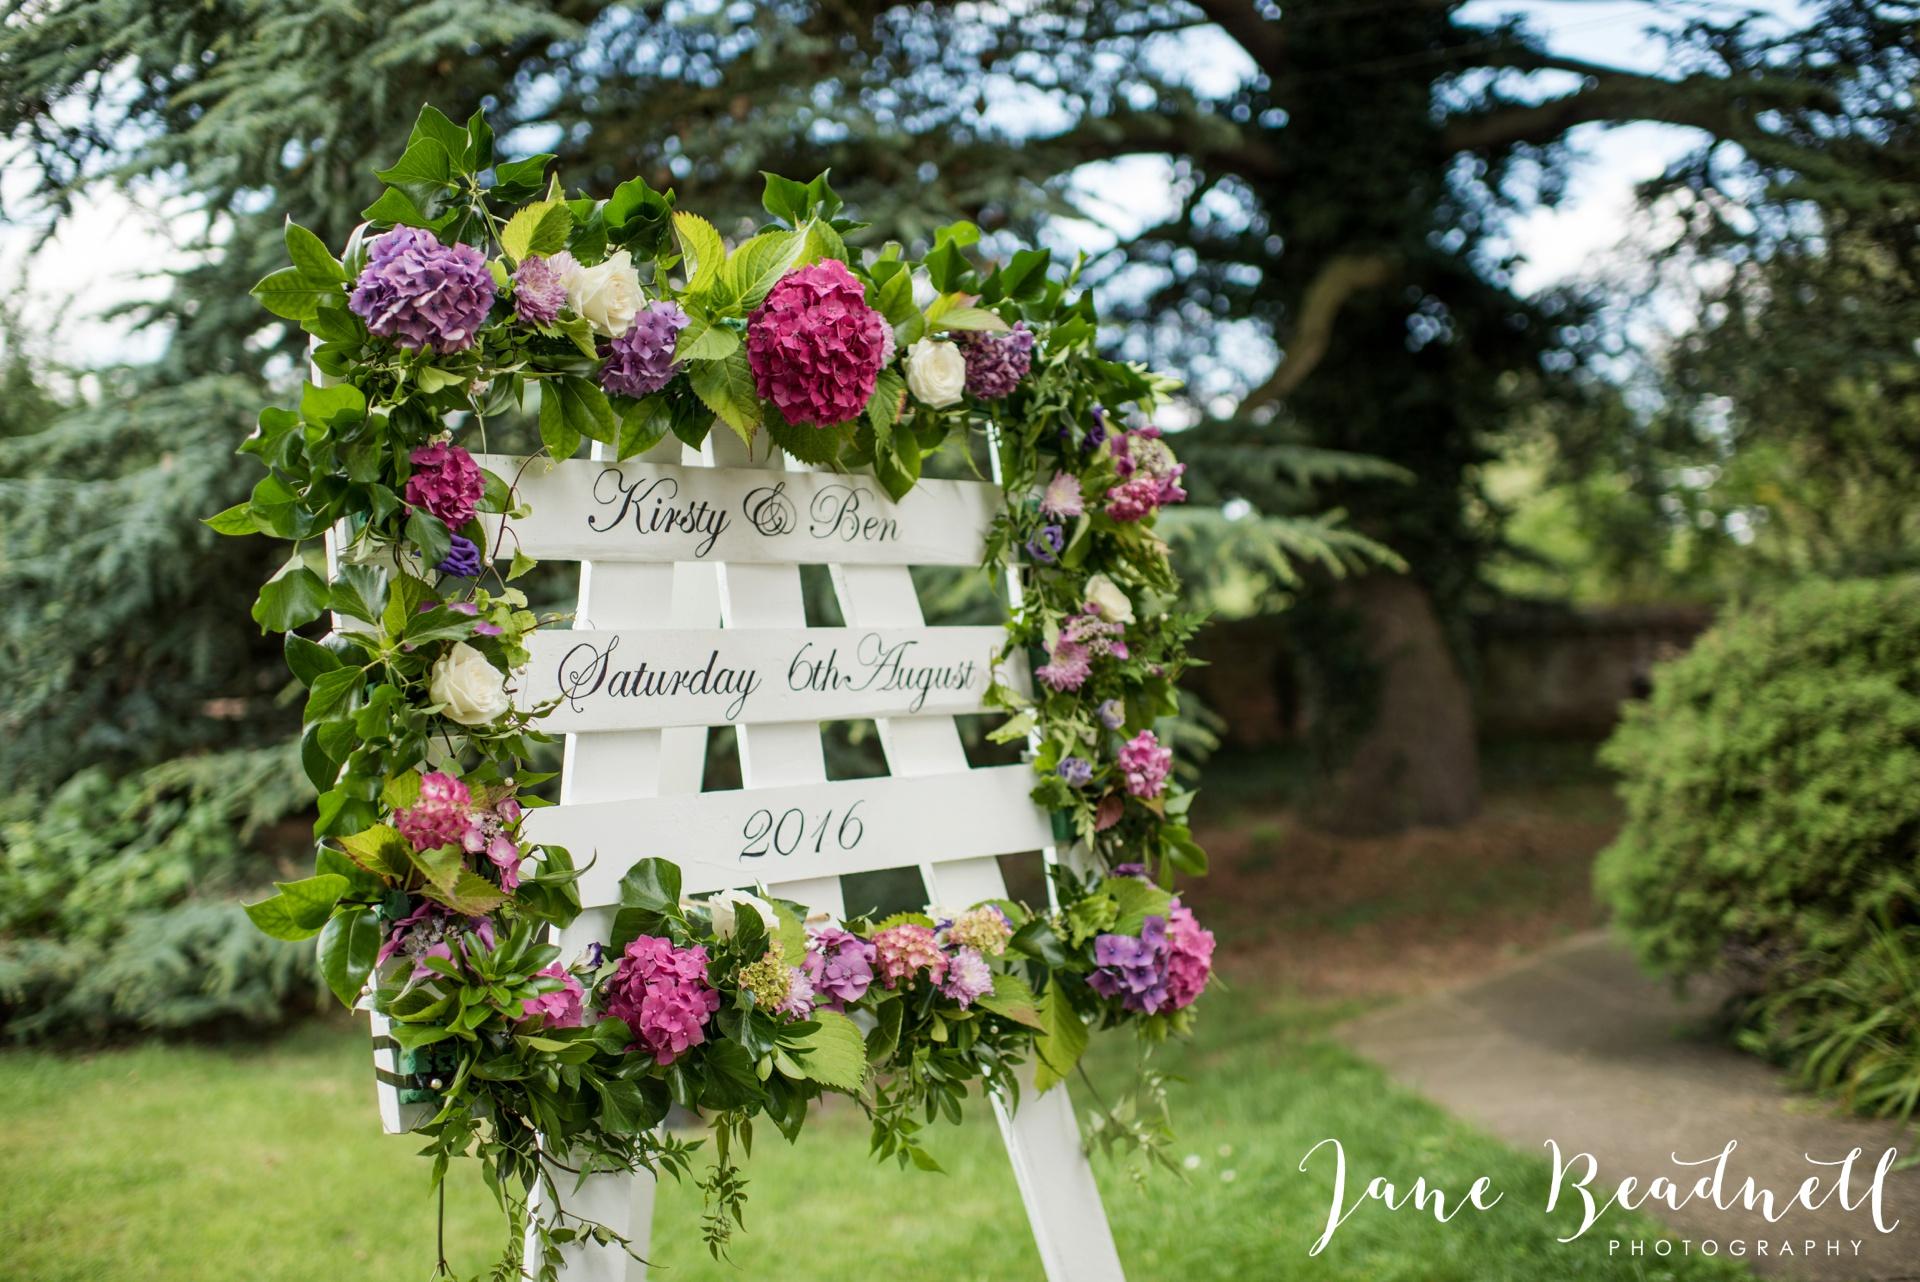 yorkshire-fine-art-wedding-photographer-jane-beadnell-photography-poppleton-york_0019